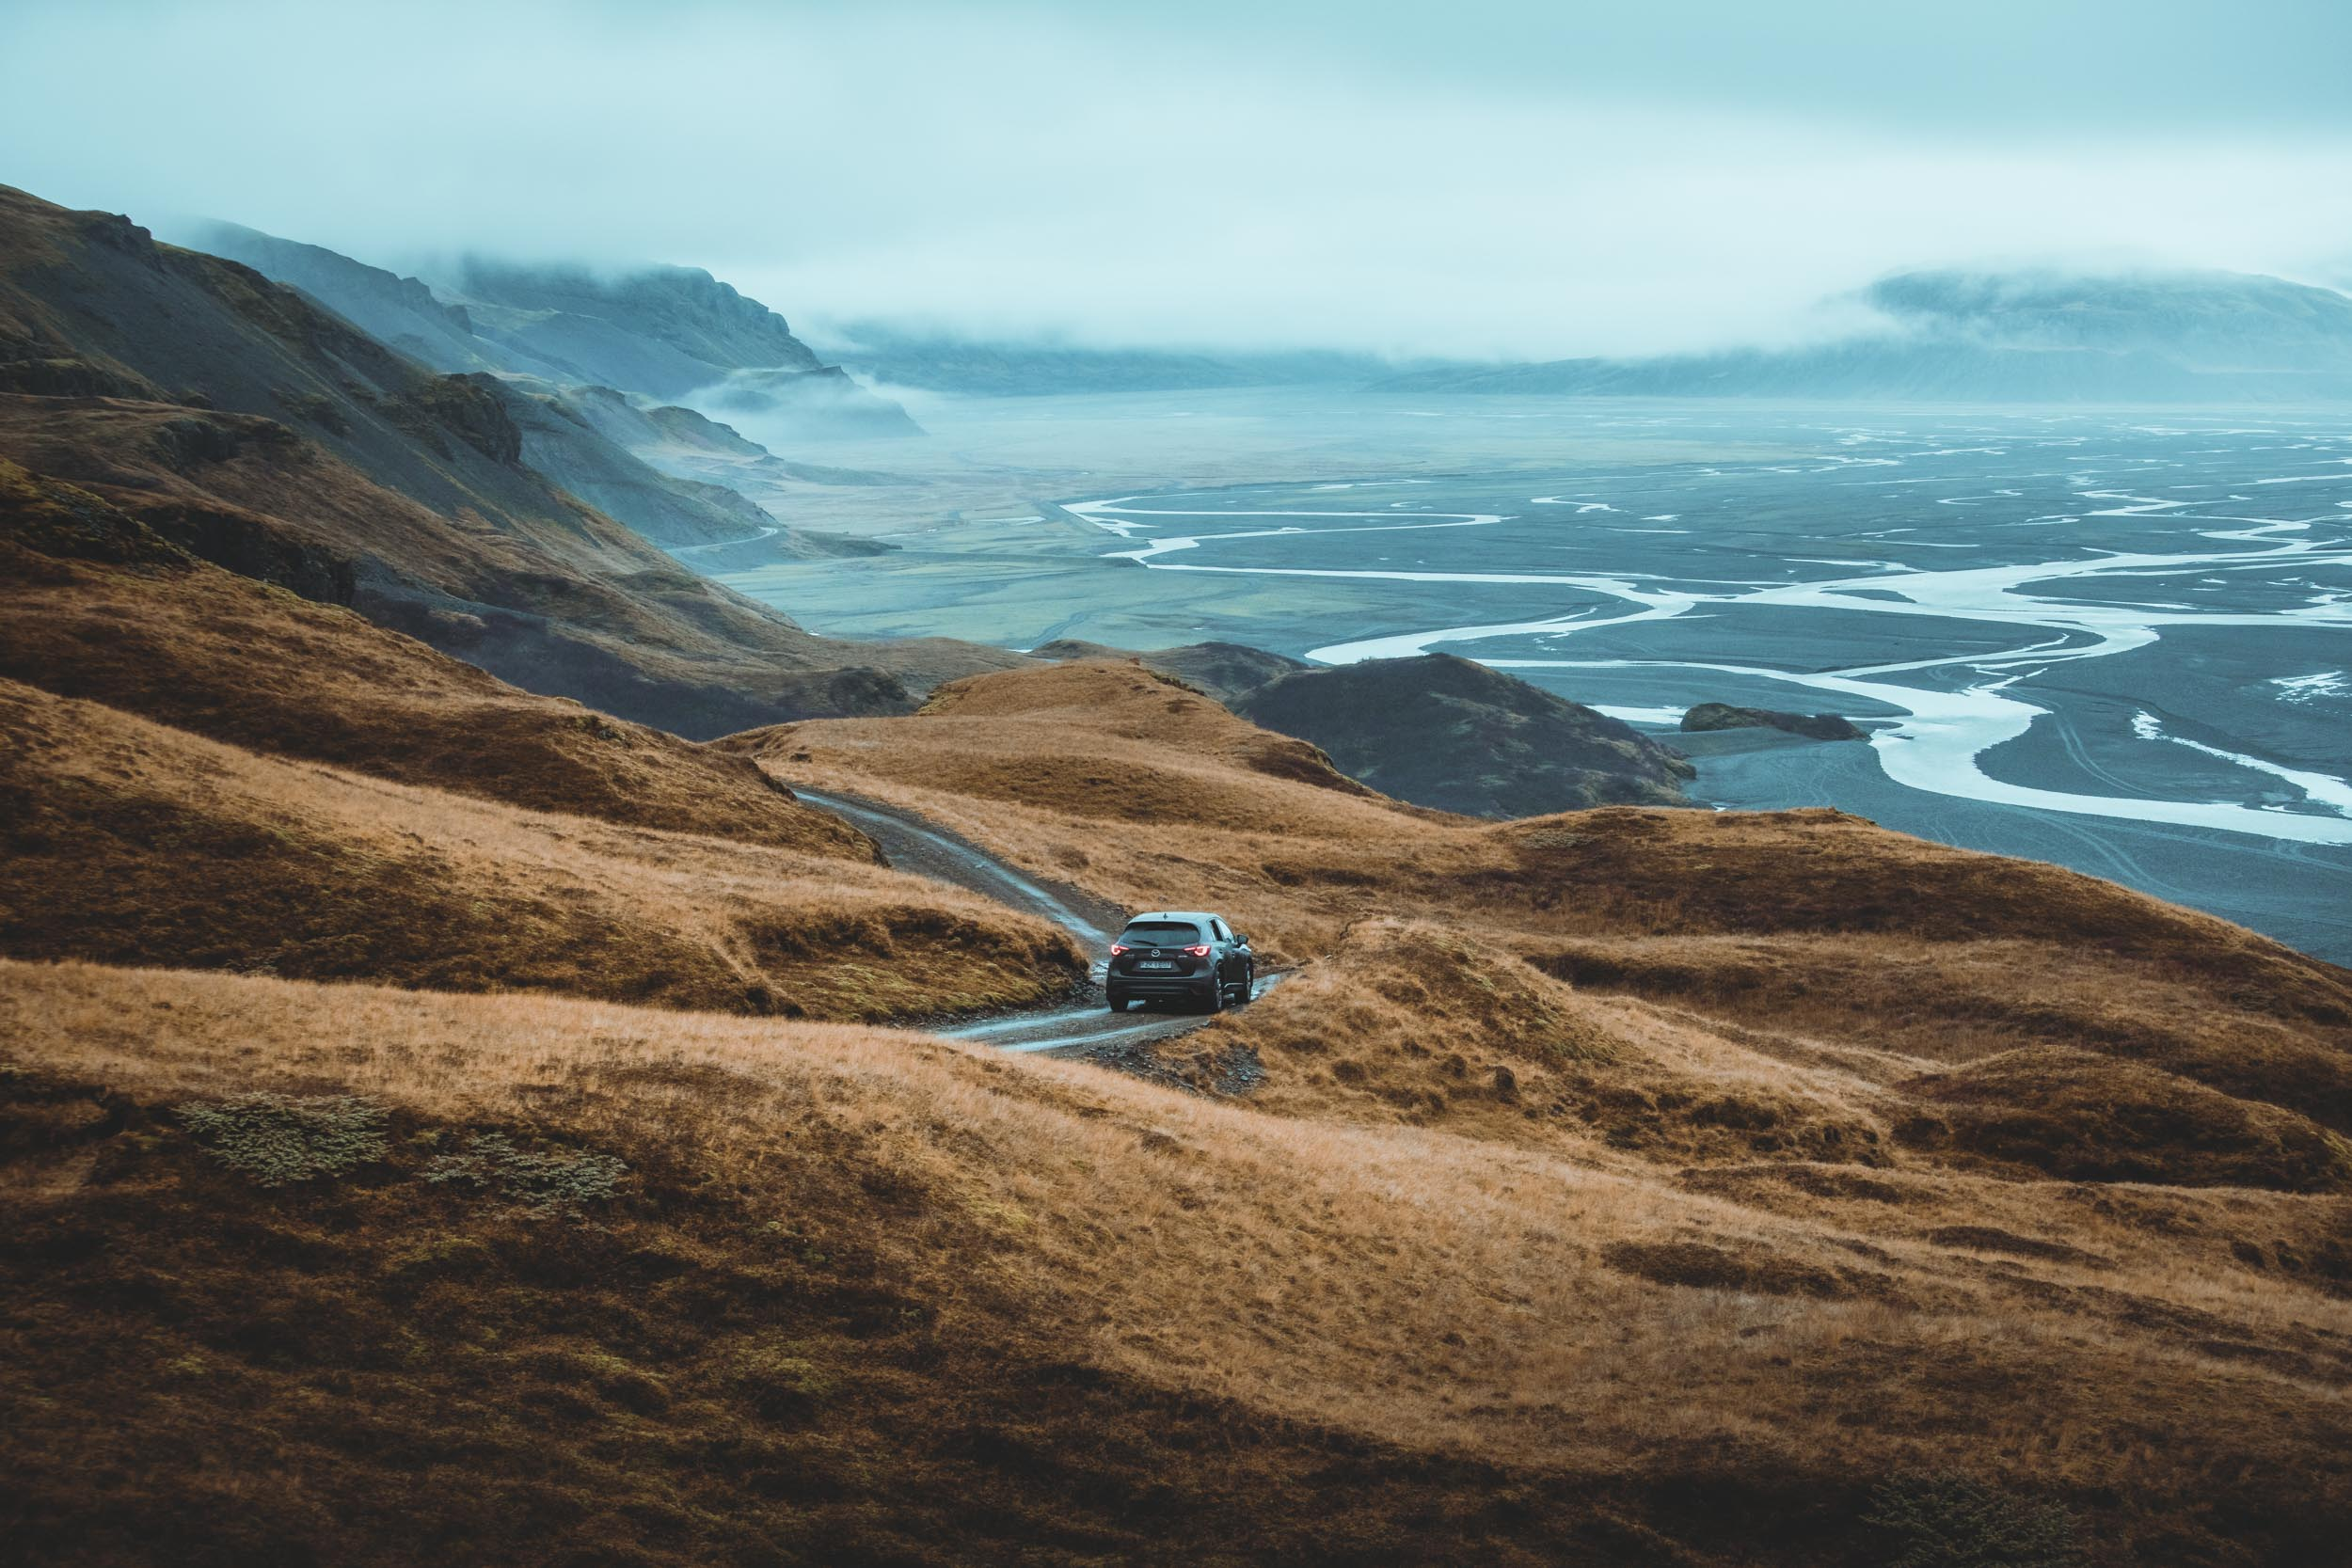 Iceland_Nov2018_ByTomKahler_Lowres (163 of 193).jpg